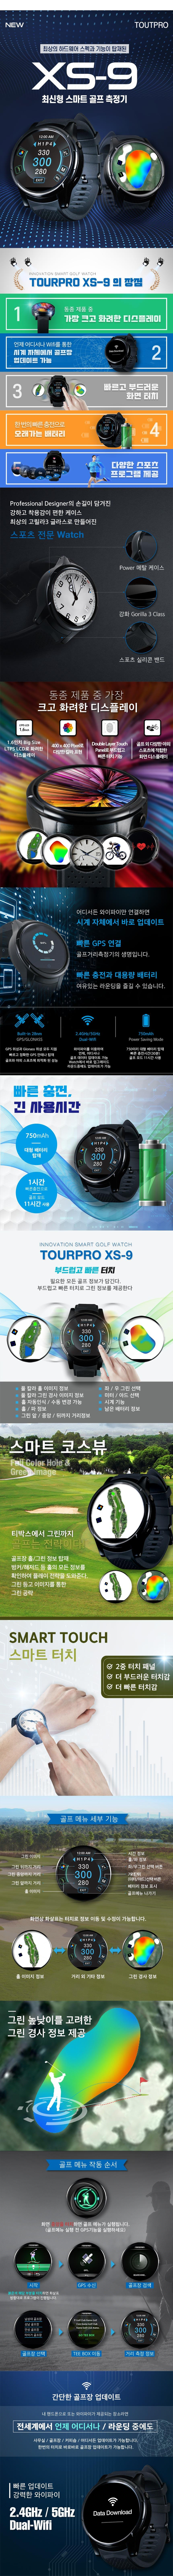 tourpro_XS9_LED_20.jpg